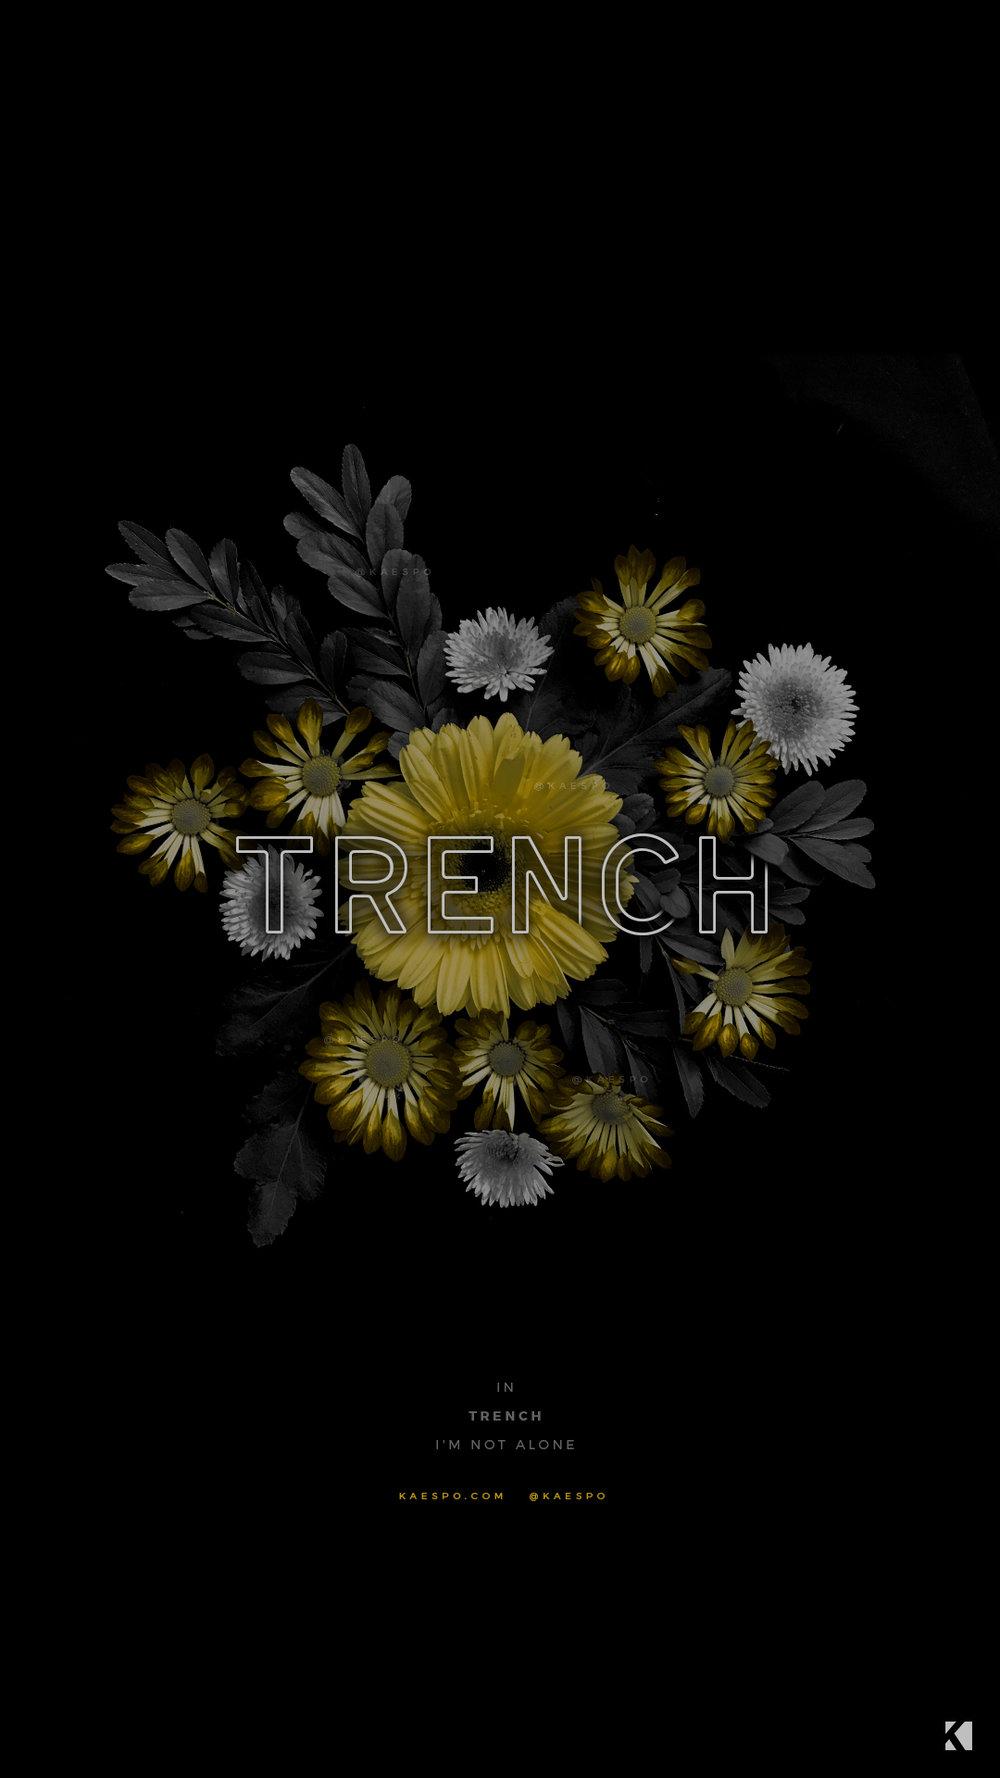 Trench Album Lyrics and Artwork | KAESPO Design & Creative Lifestyle Blog